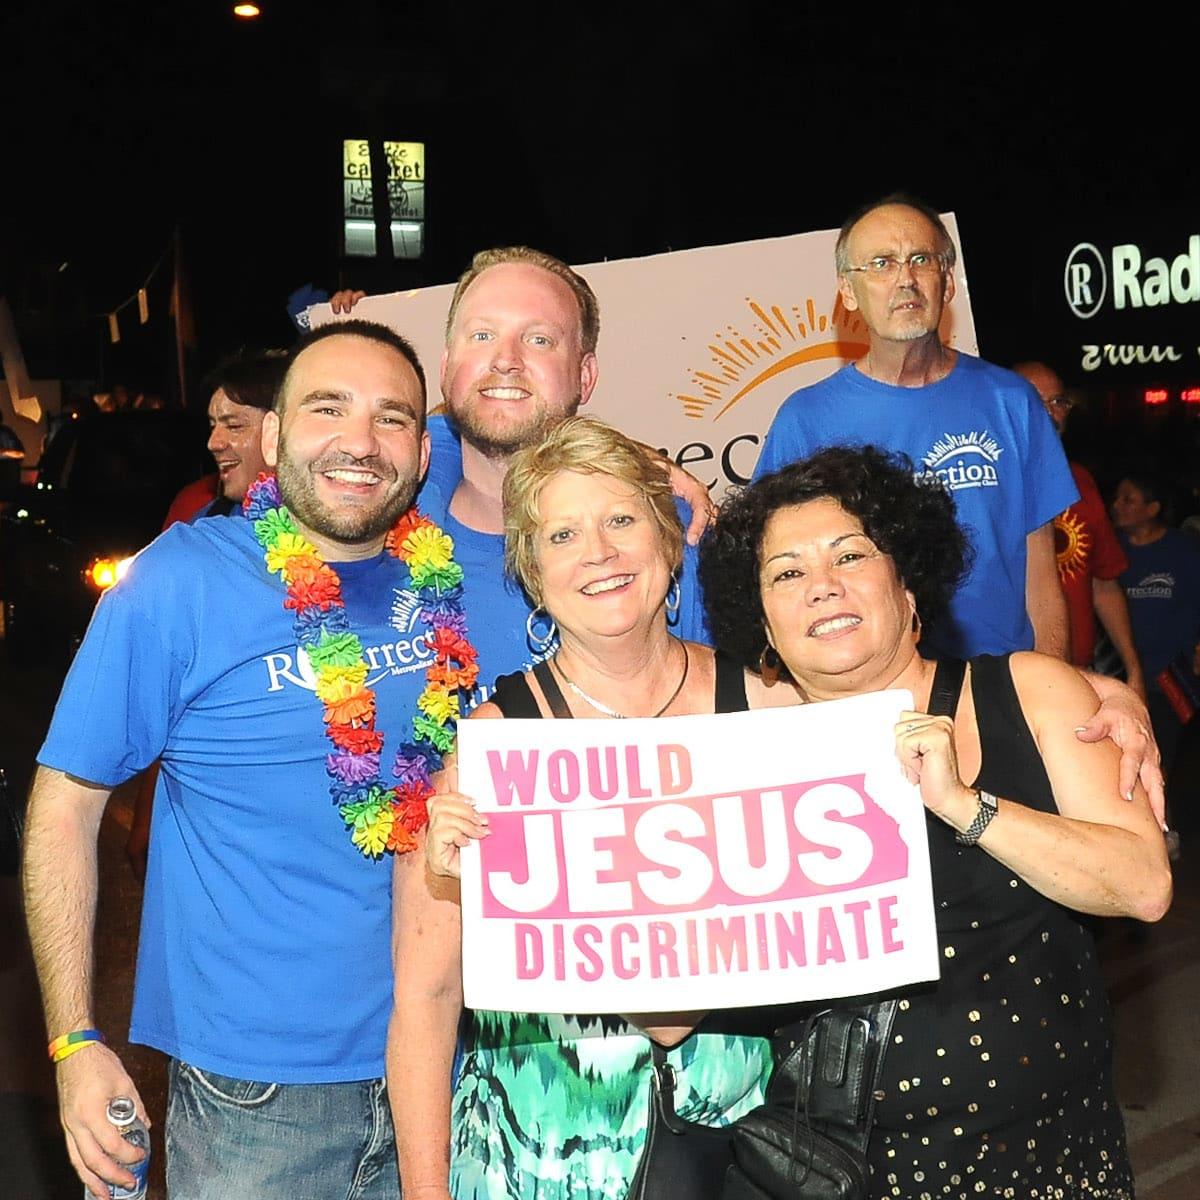 News_Gay Pride Parade_would Jesus discriminate